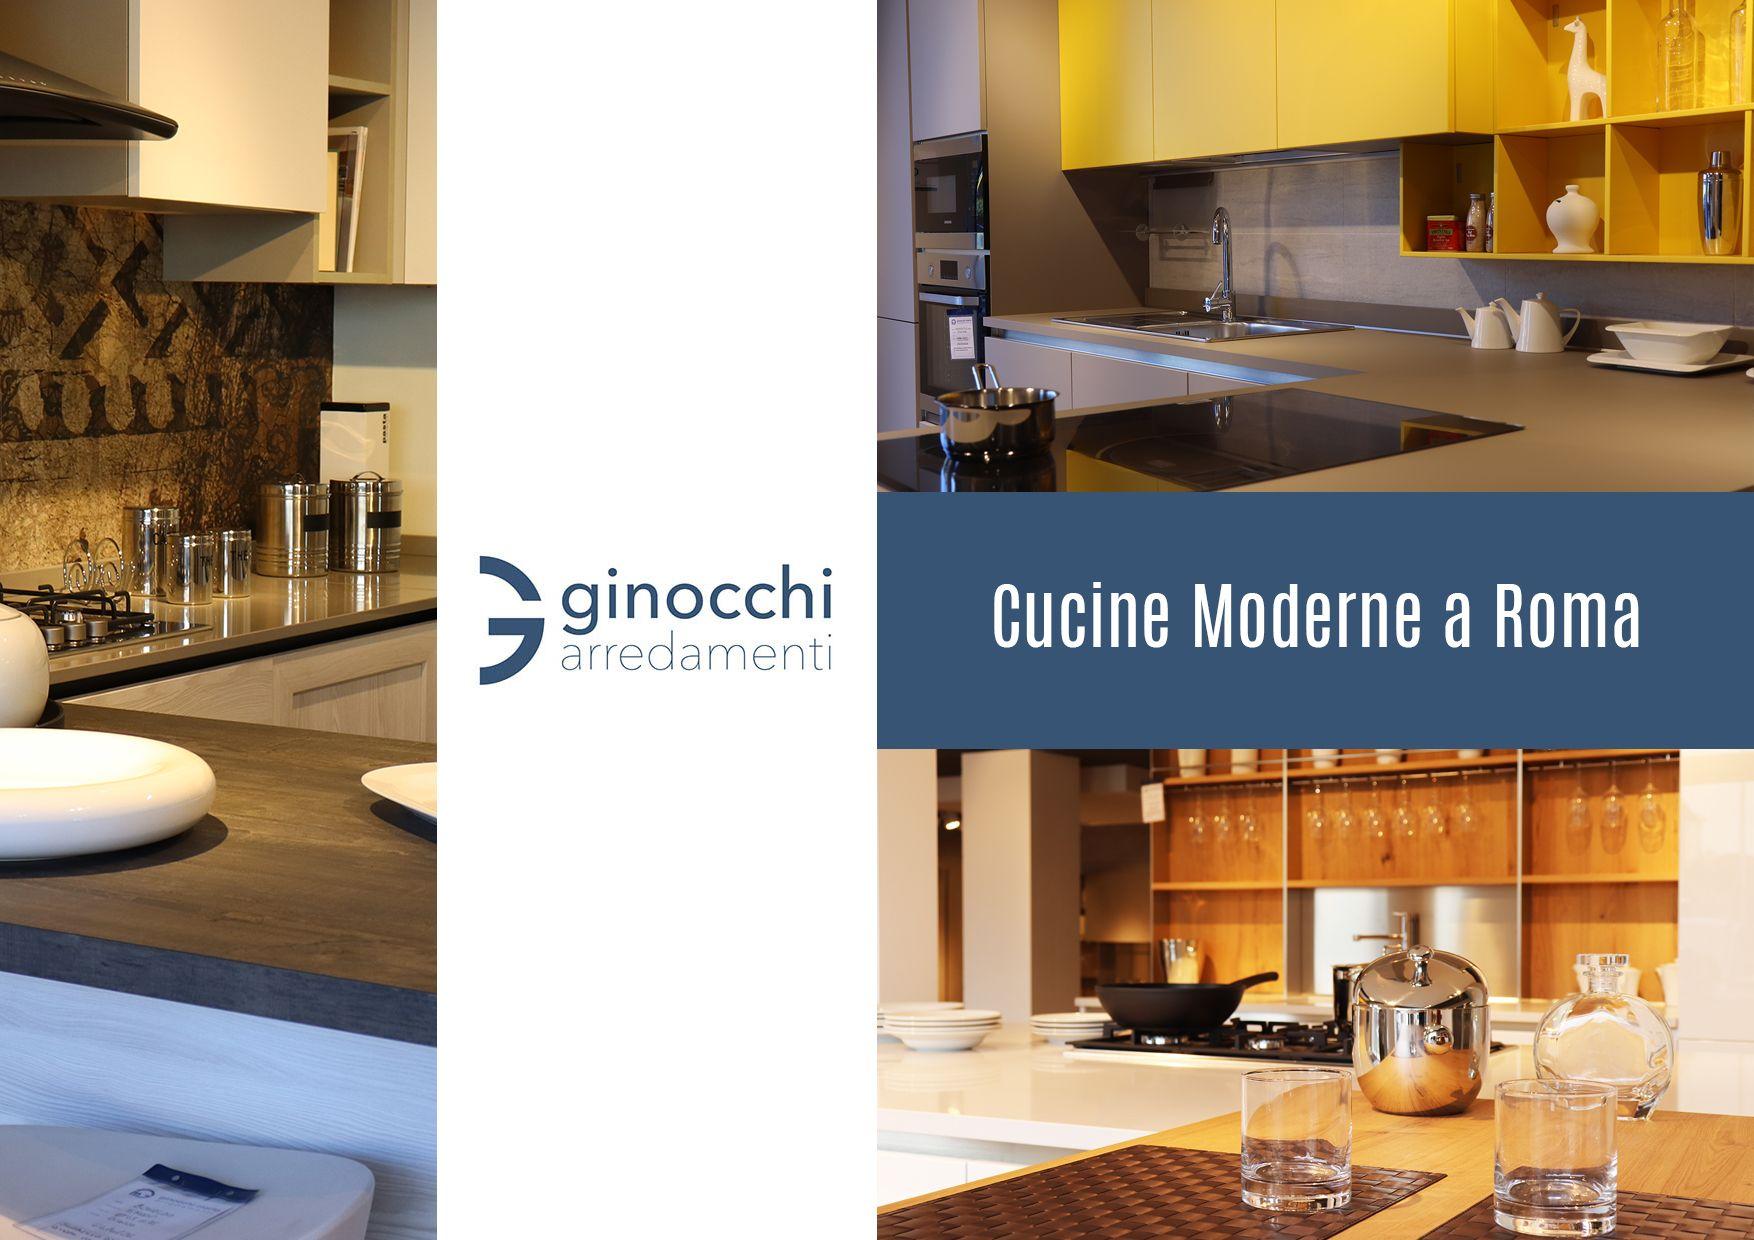 Cucine Moderne a Roma | Cucine Moderne | Cucine moderne ...